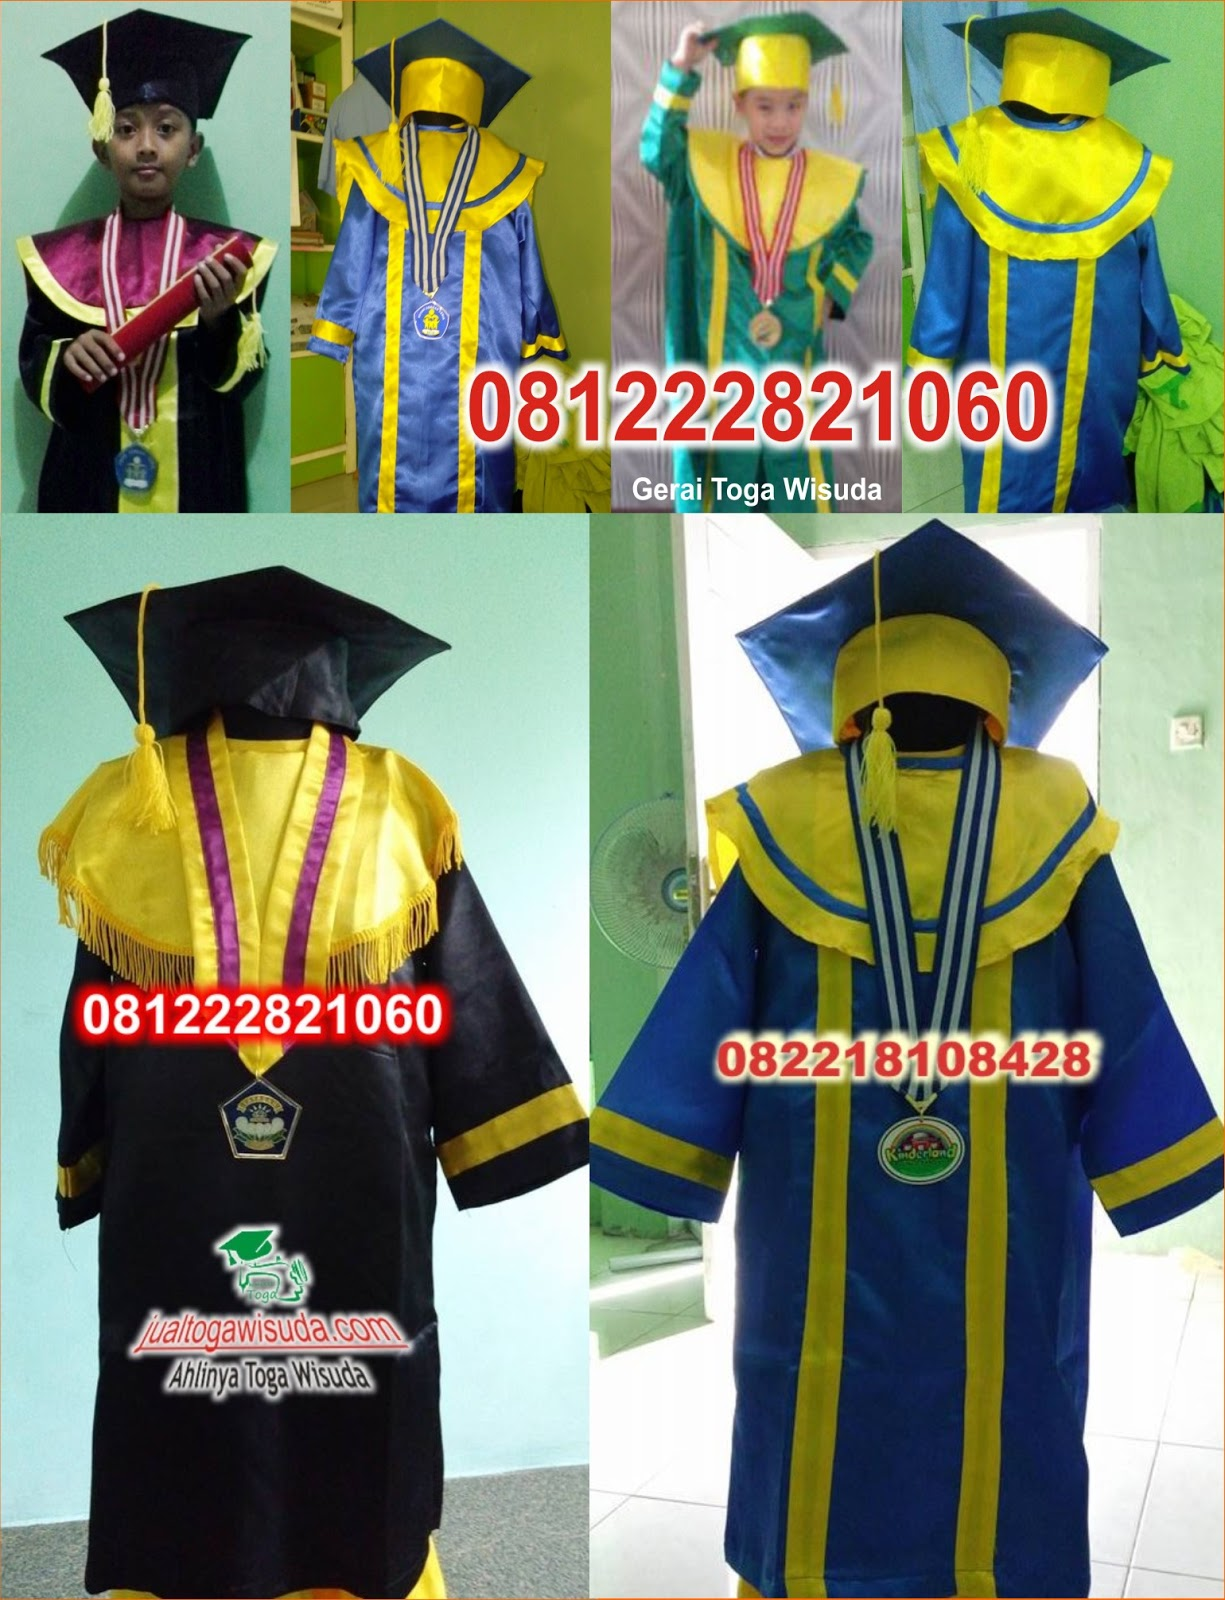 880 Model Baju Wisuda Anak Tk Gratis